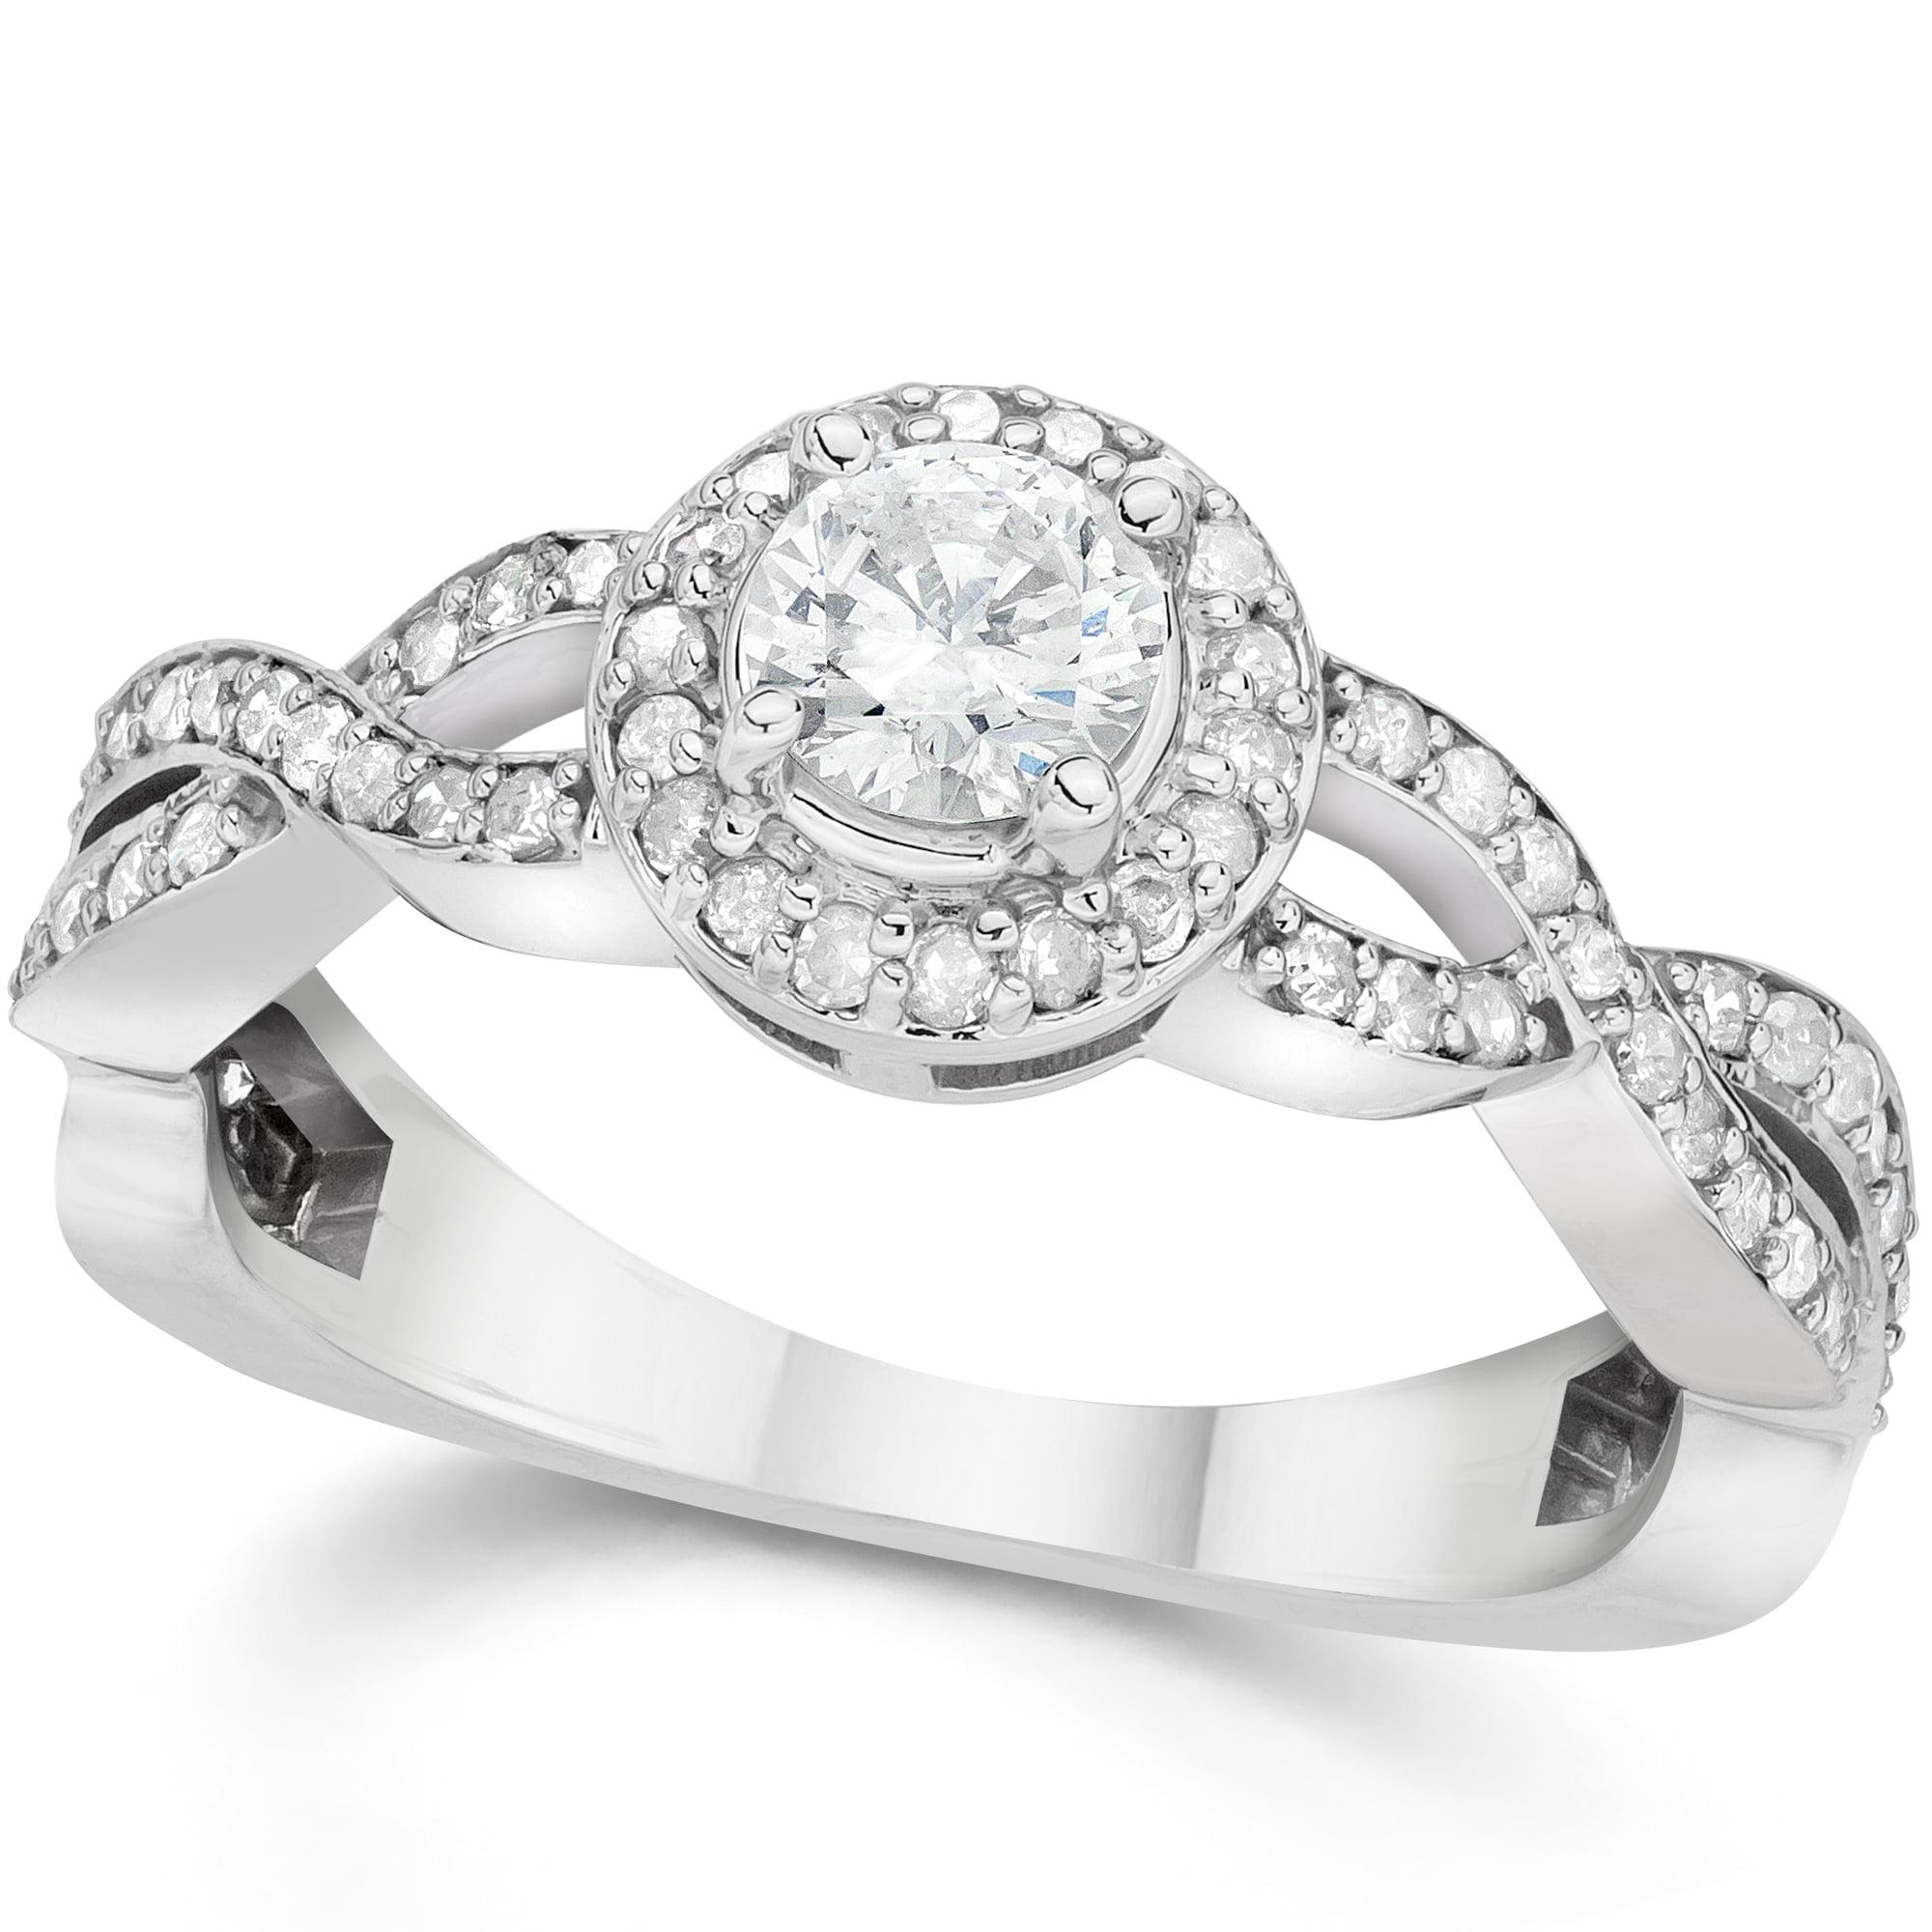 7 8ct Infinity Diamond Engagement Halo Ring 14K White Gold by Pompeii3